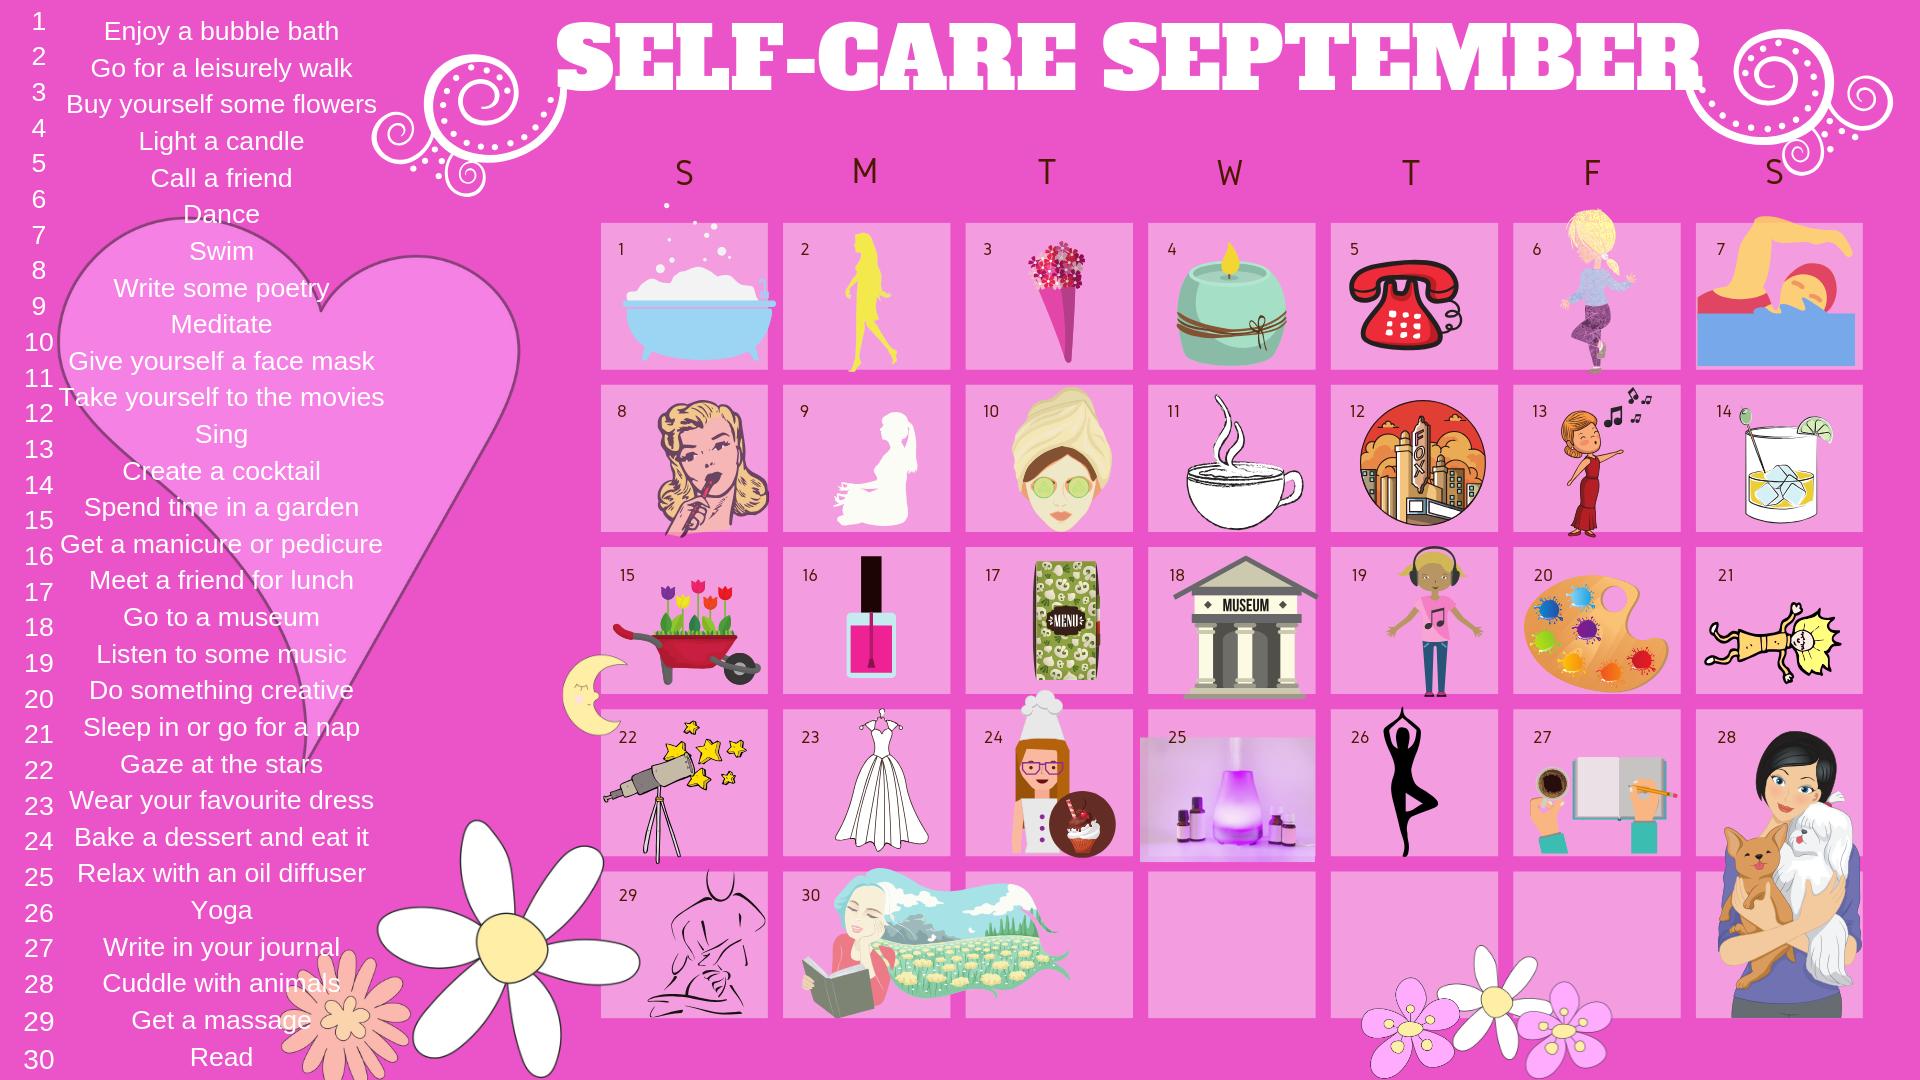 self care september (2).png